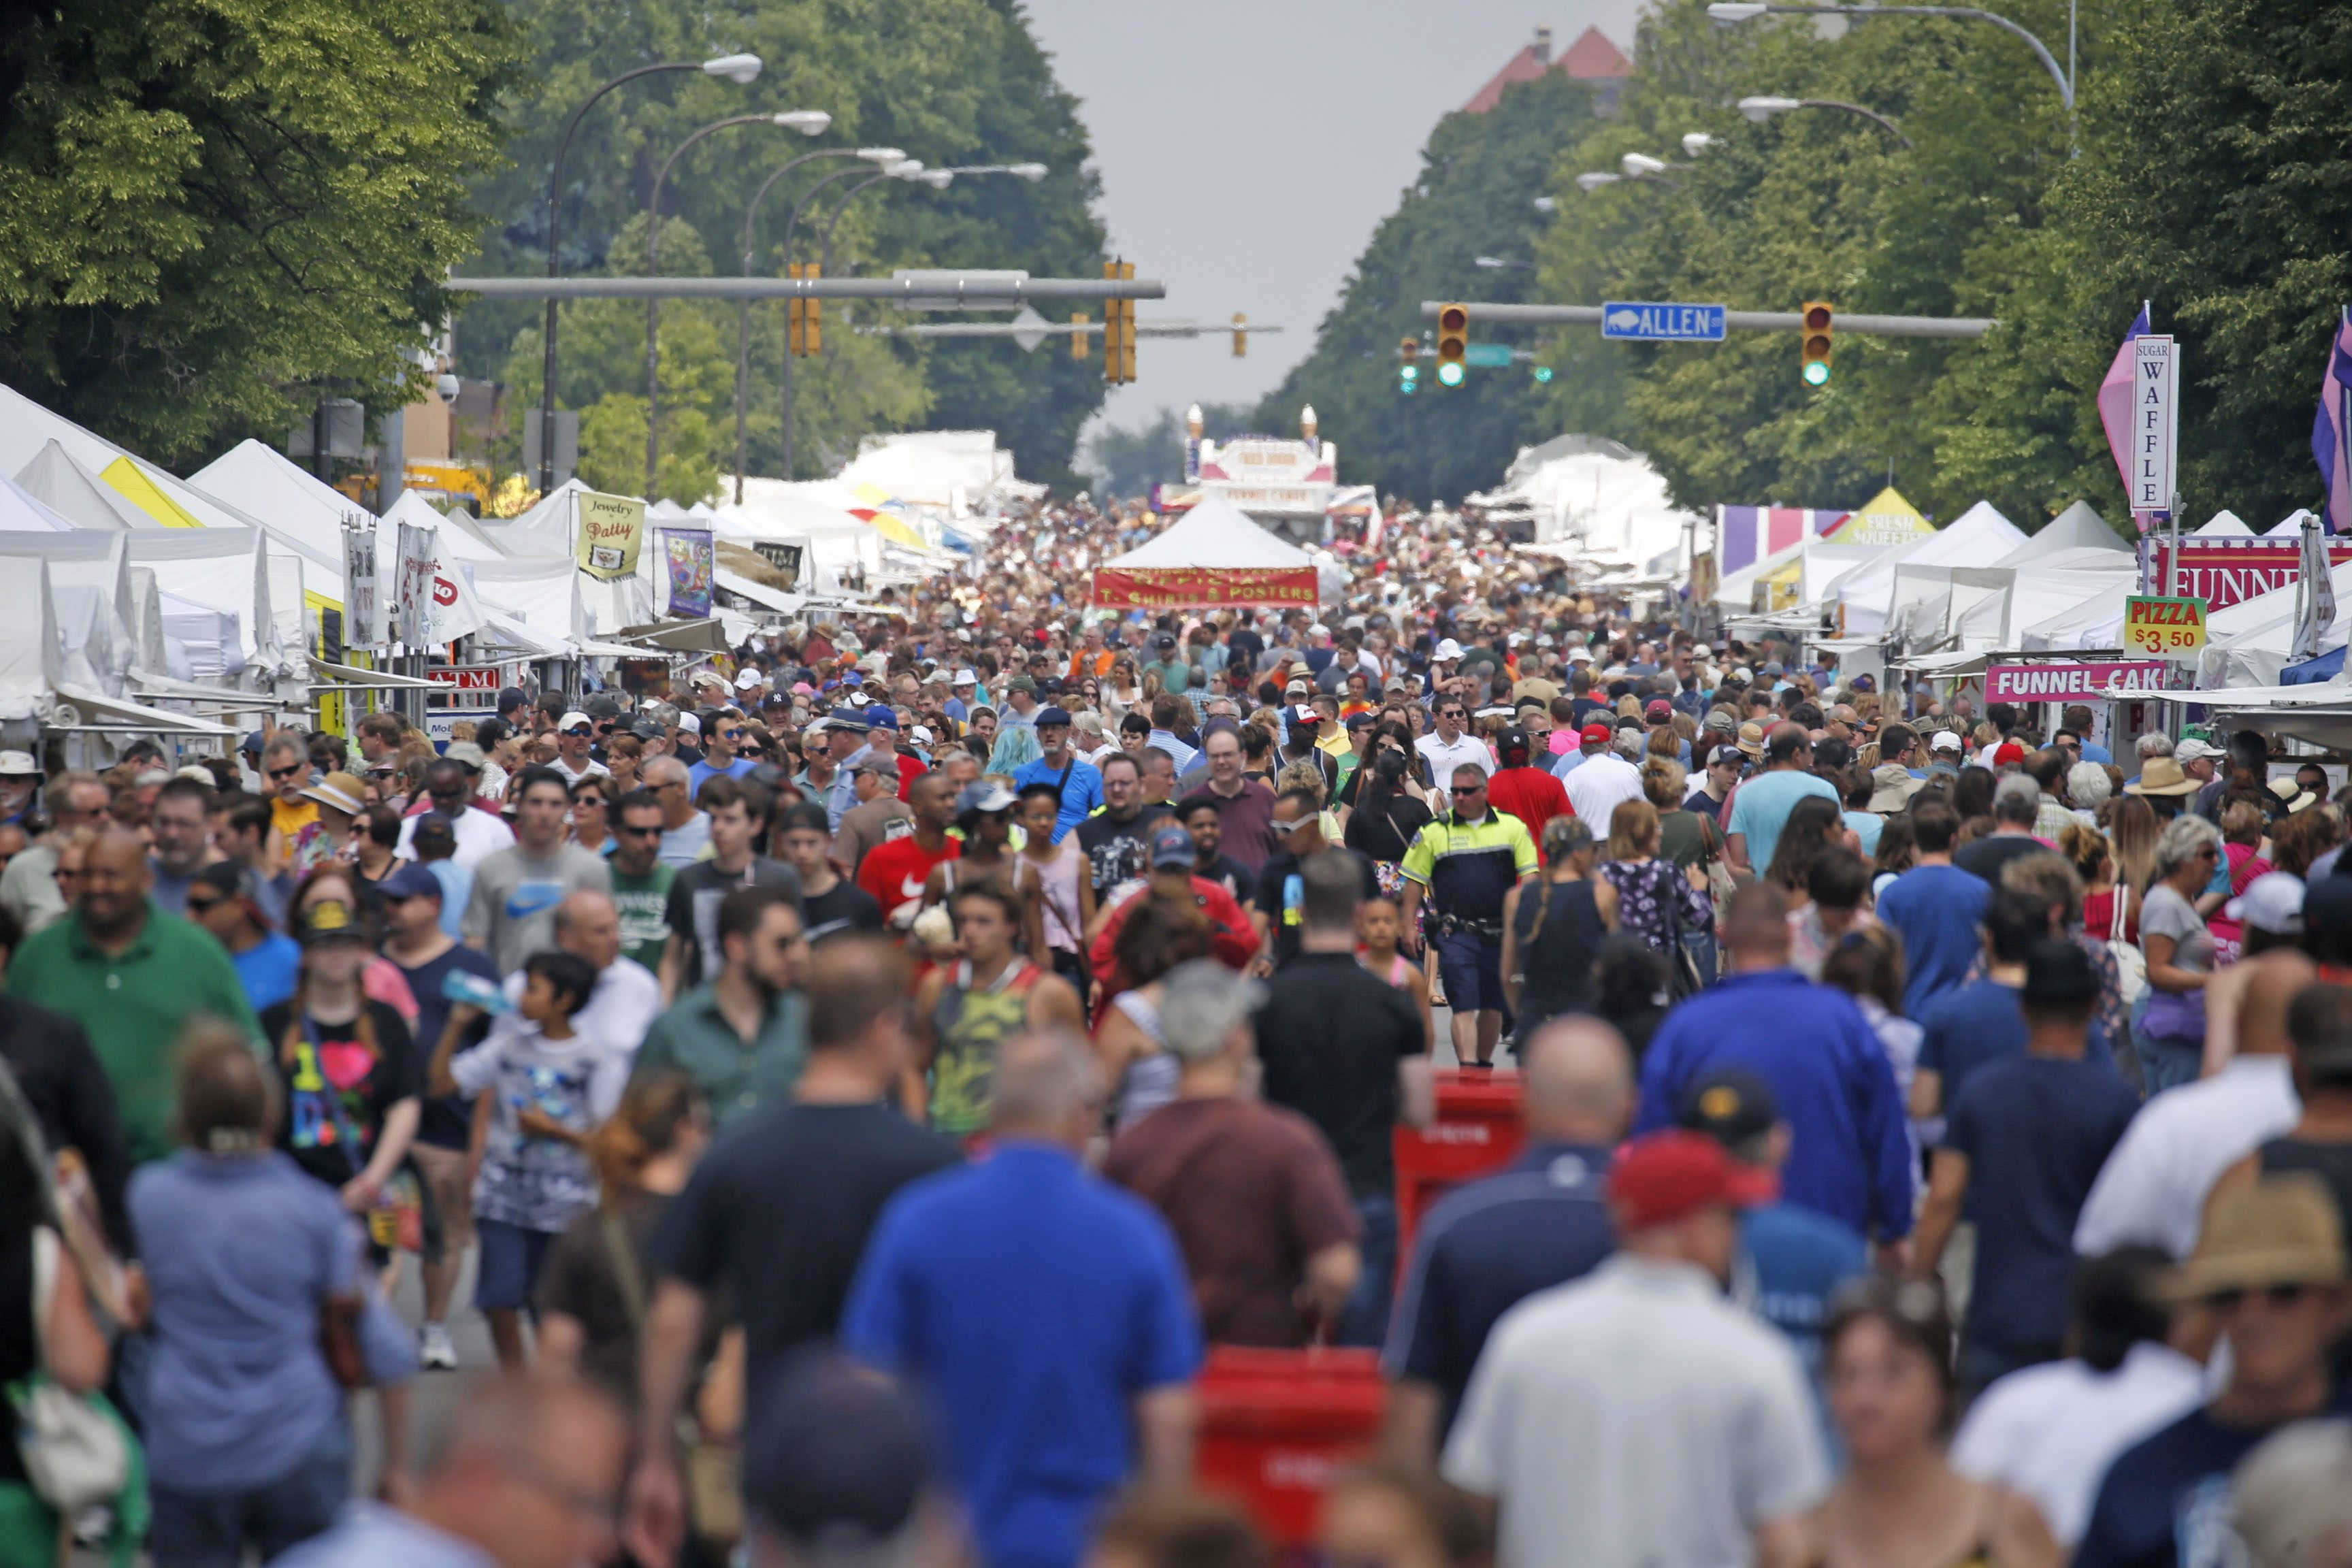 The 61st Annual Allentown Art Festival runs from 10 a.m. to 6 p.m. June 9 and 10. (Robert Kirkham/Buffalo News file photo)